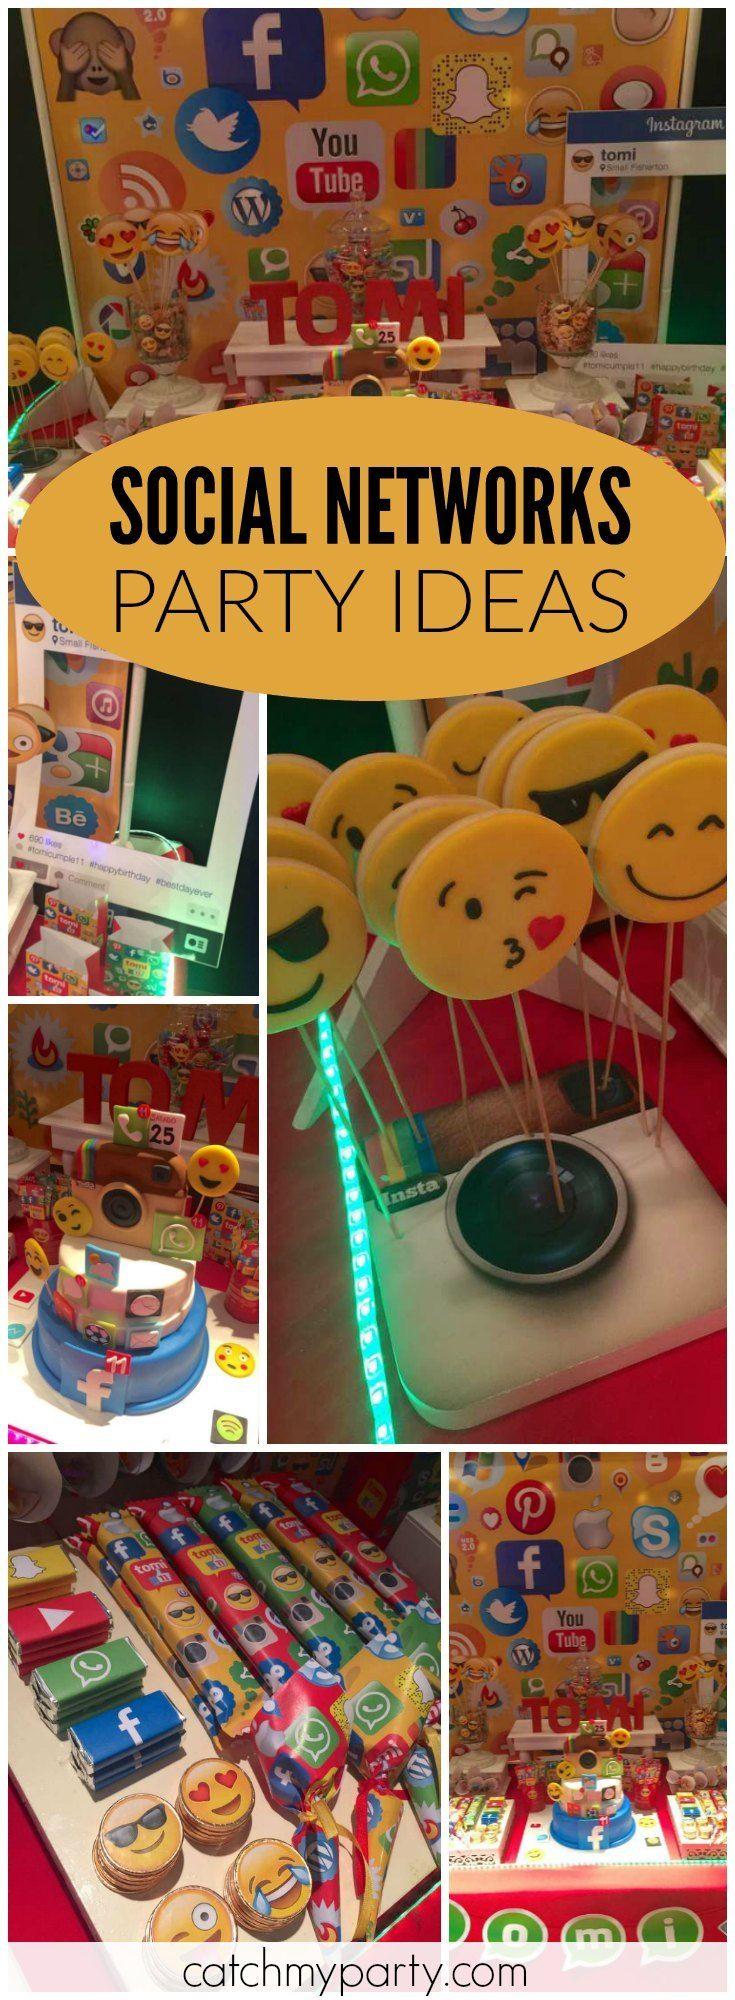 Social Networks Redes Sociales Birthday Social Networks For Tomi Redes Sociales Para Tomi Catch My Party Birthday Party For Teens Emoji Birthday Party Emoji Party